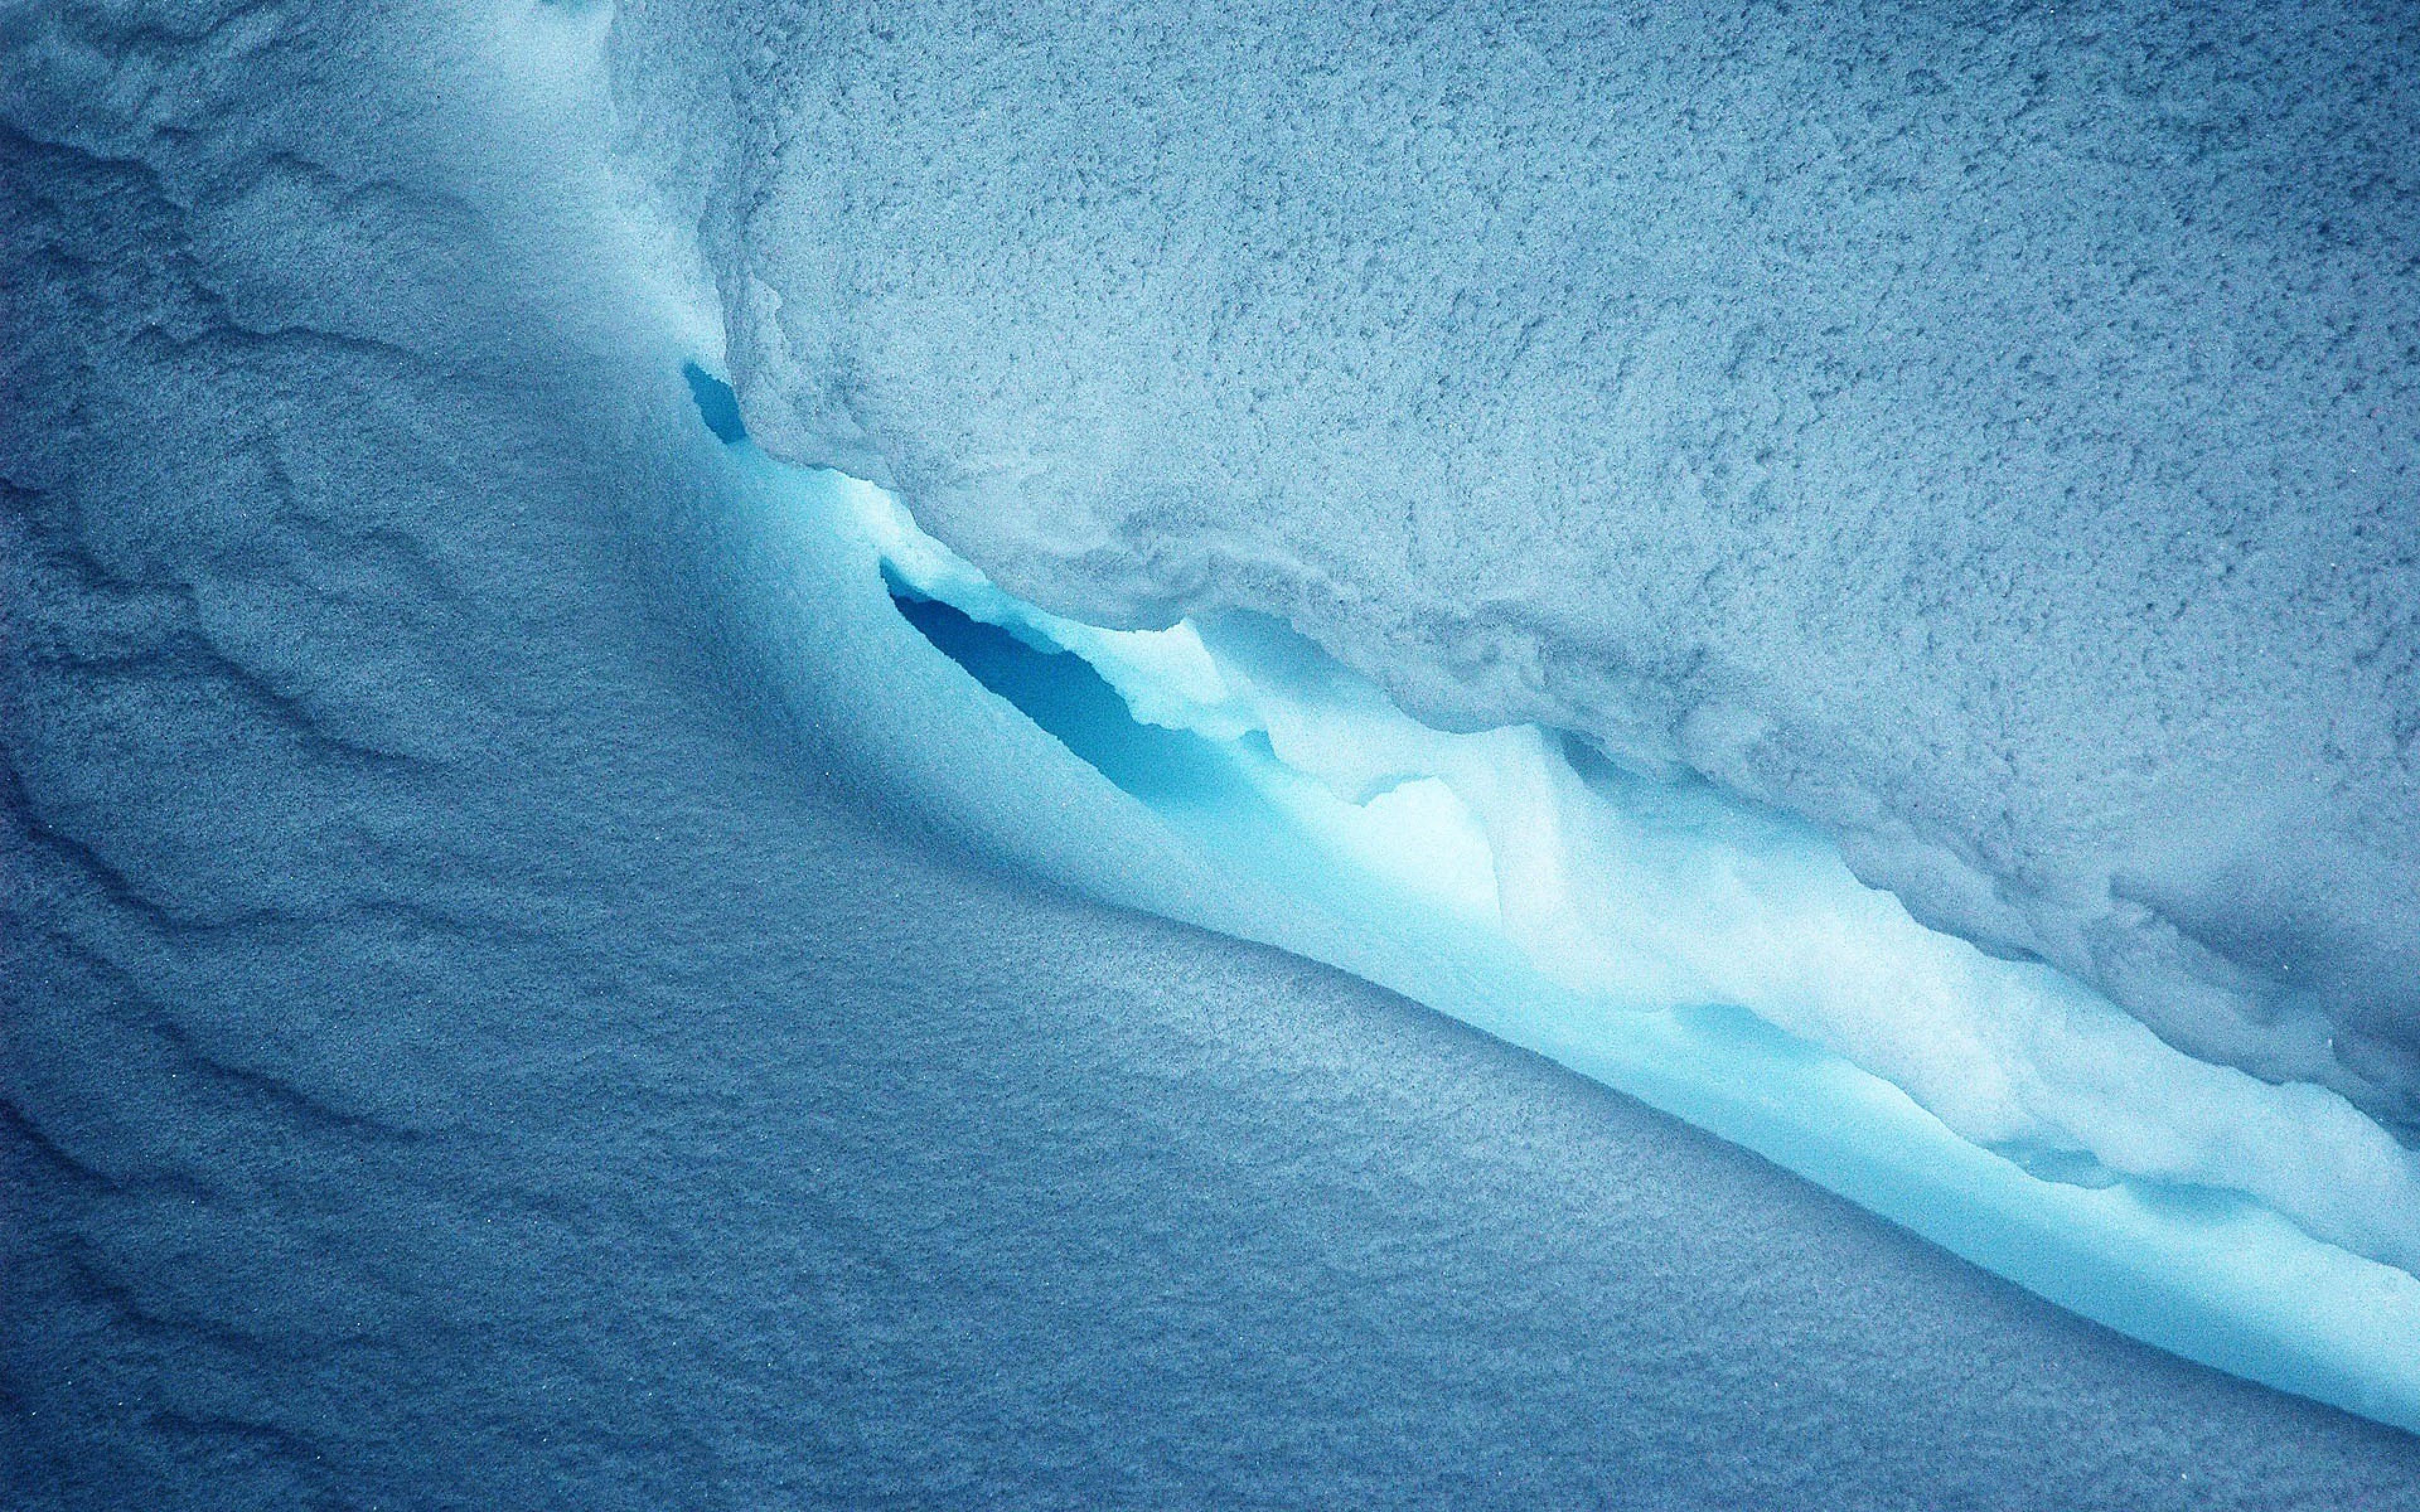 ice_cave_blue_104138_3840x2400